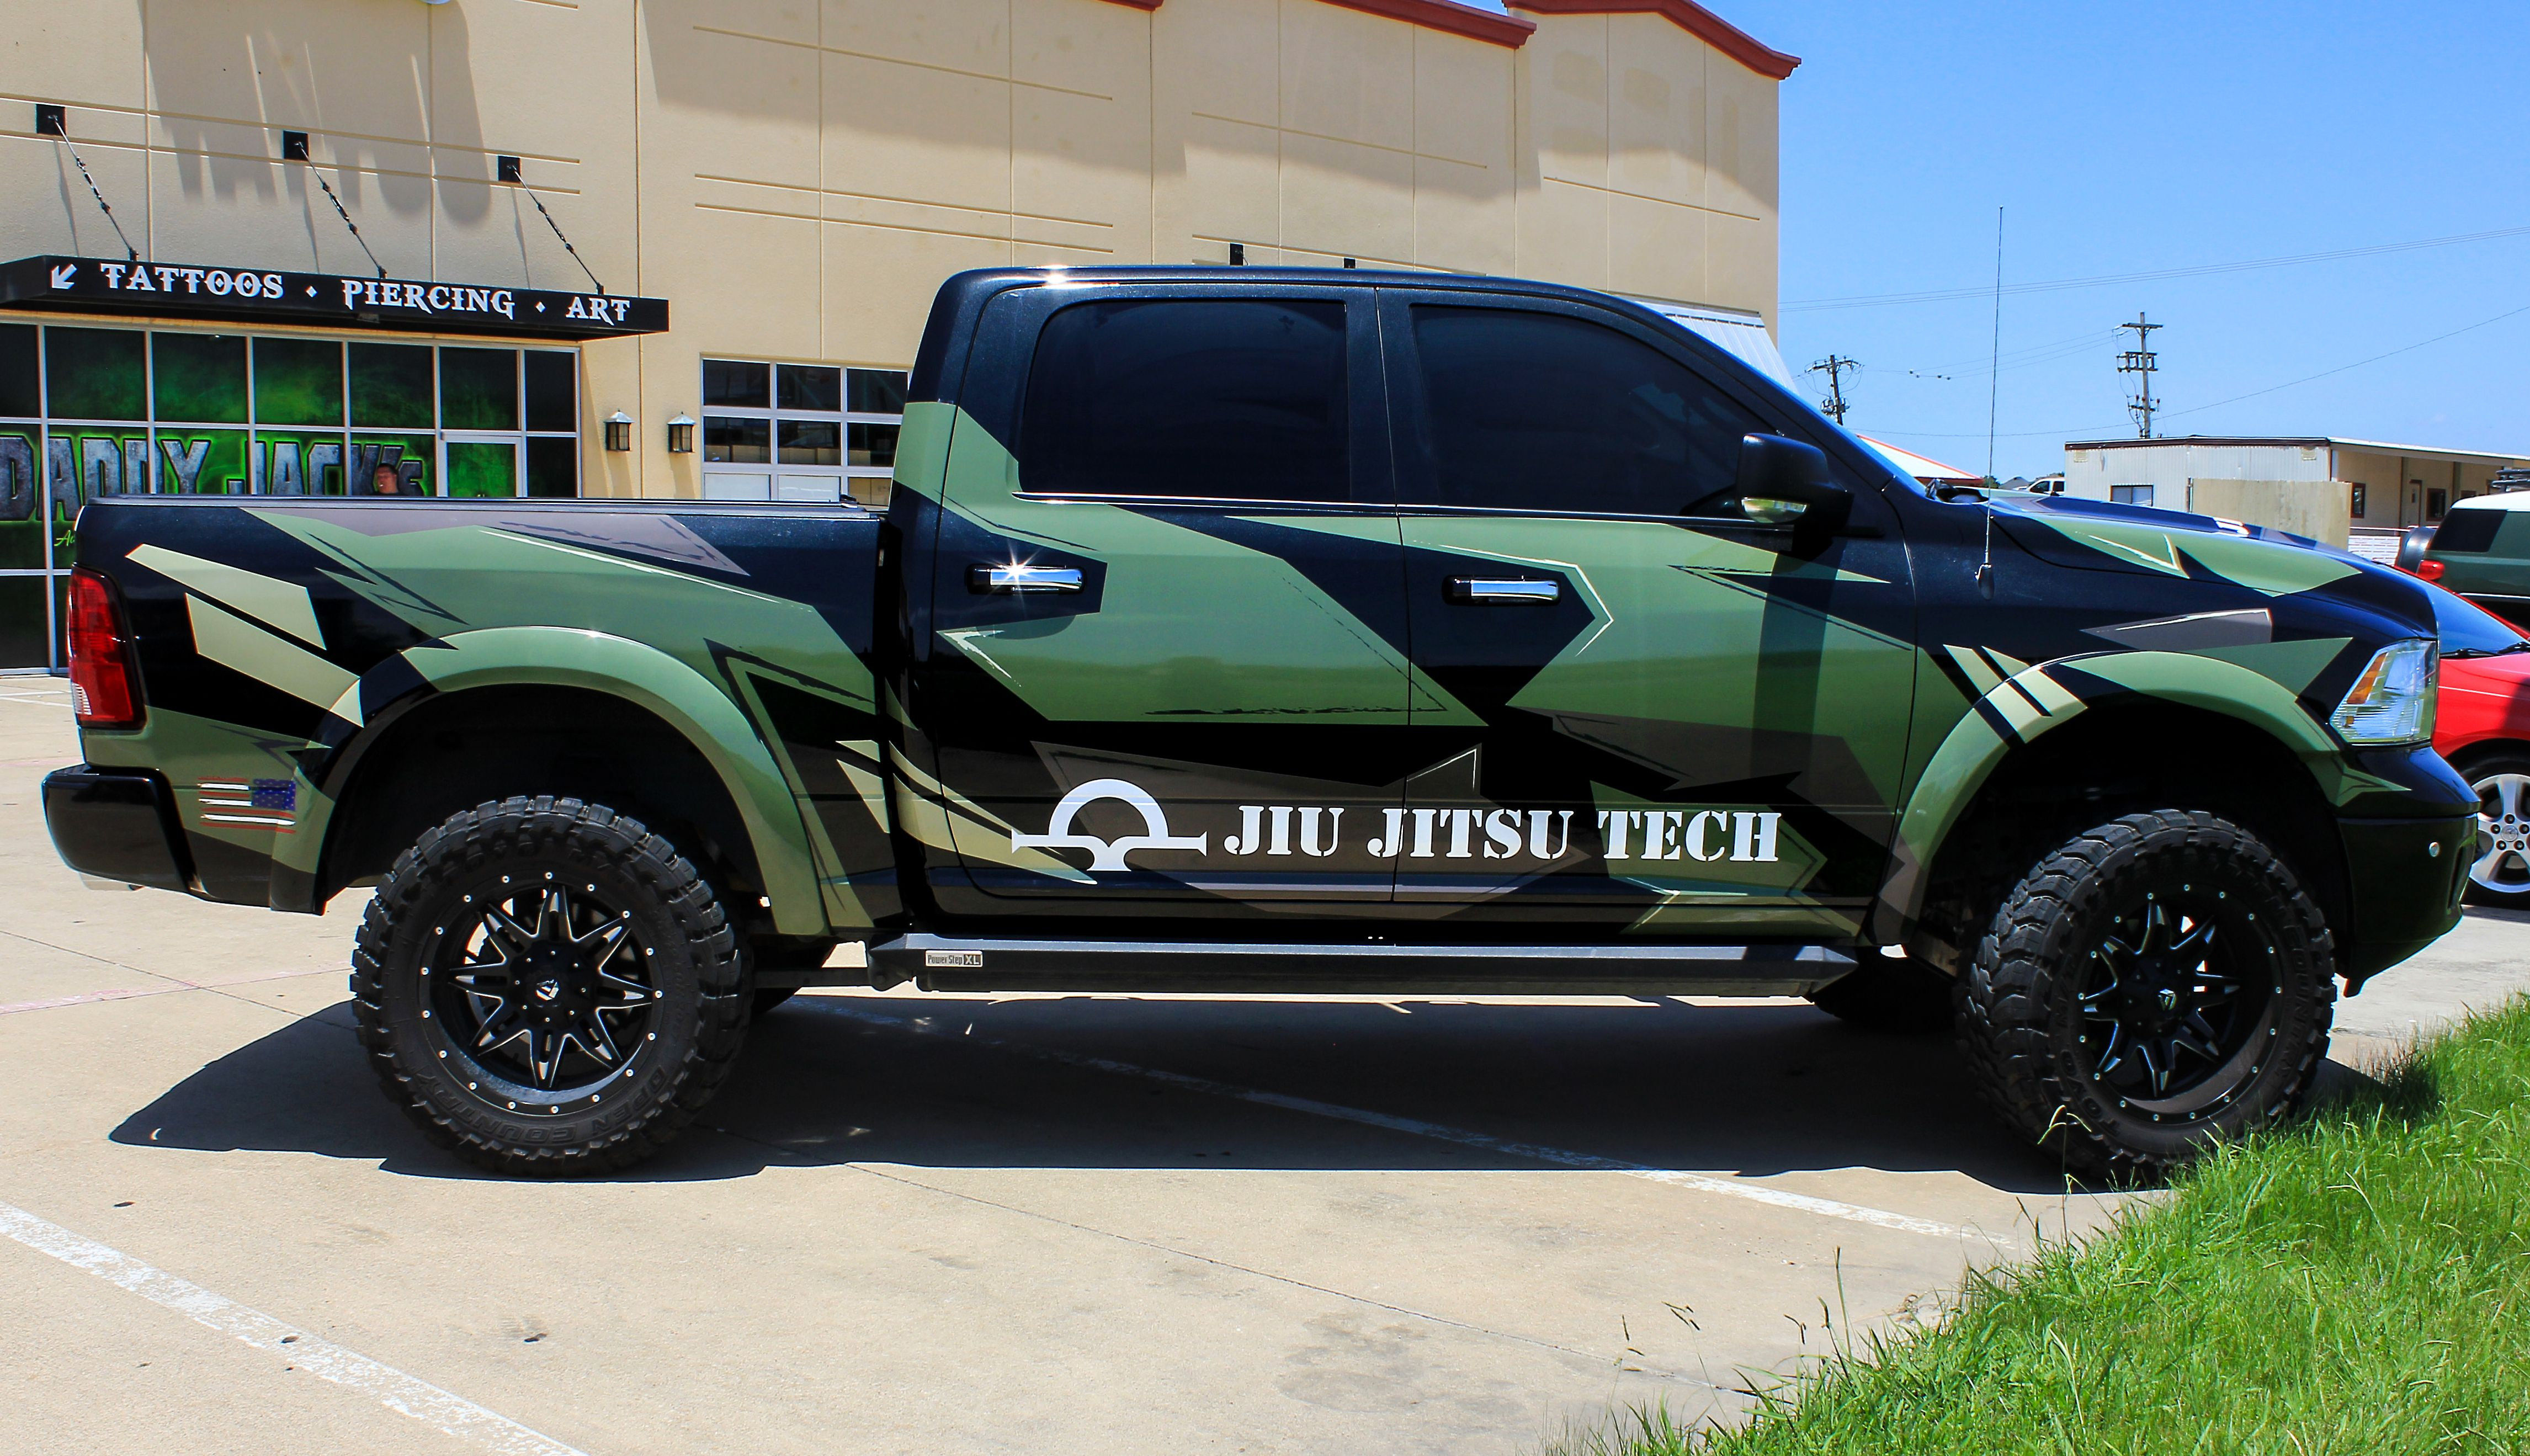 Custom Military Camo Military Green Truck Digi Camo Ideas Custom Trucks Camo Wraps Car Wrap Truck Wraps Graphics